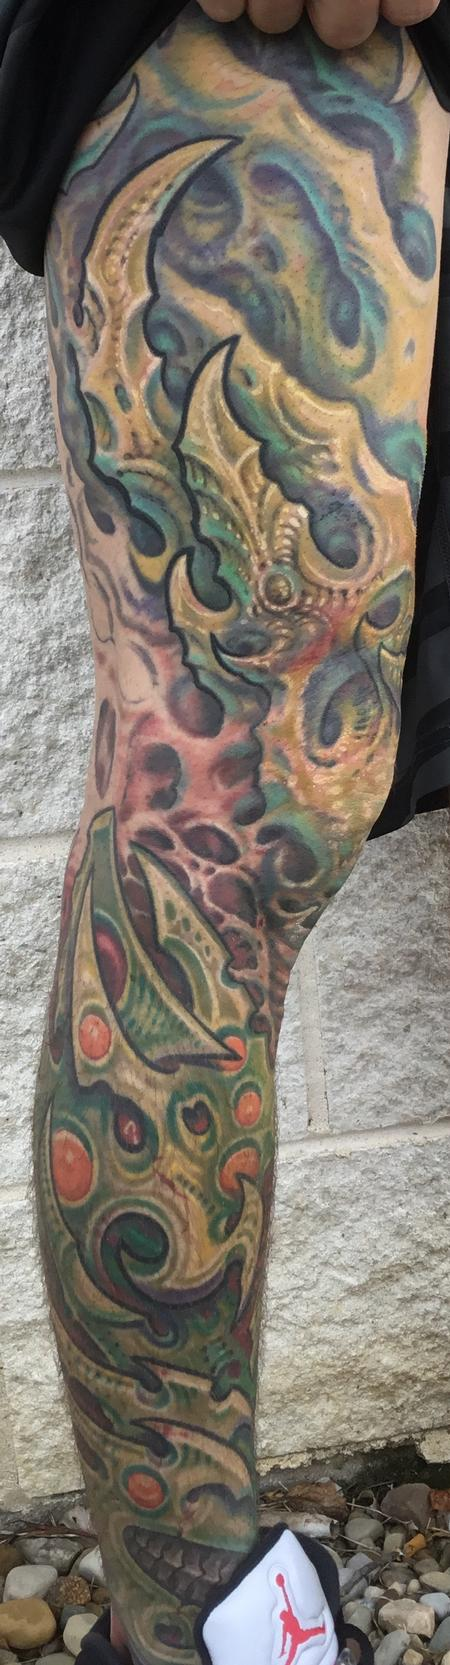 tattoos/ - Biomech leg sleeve - 122407